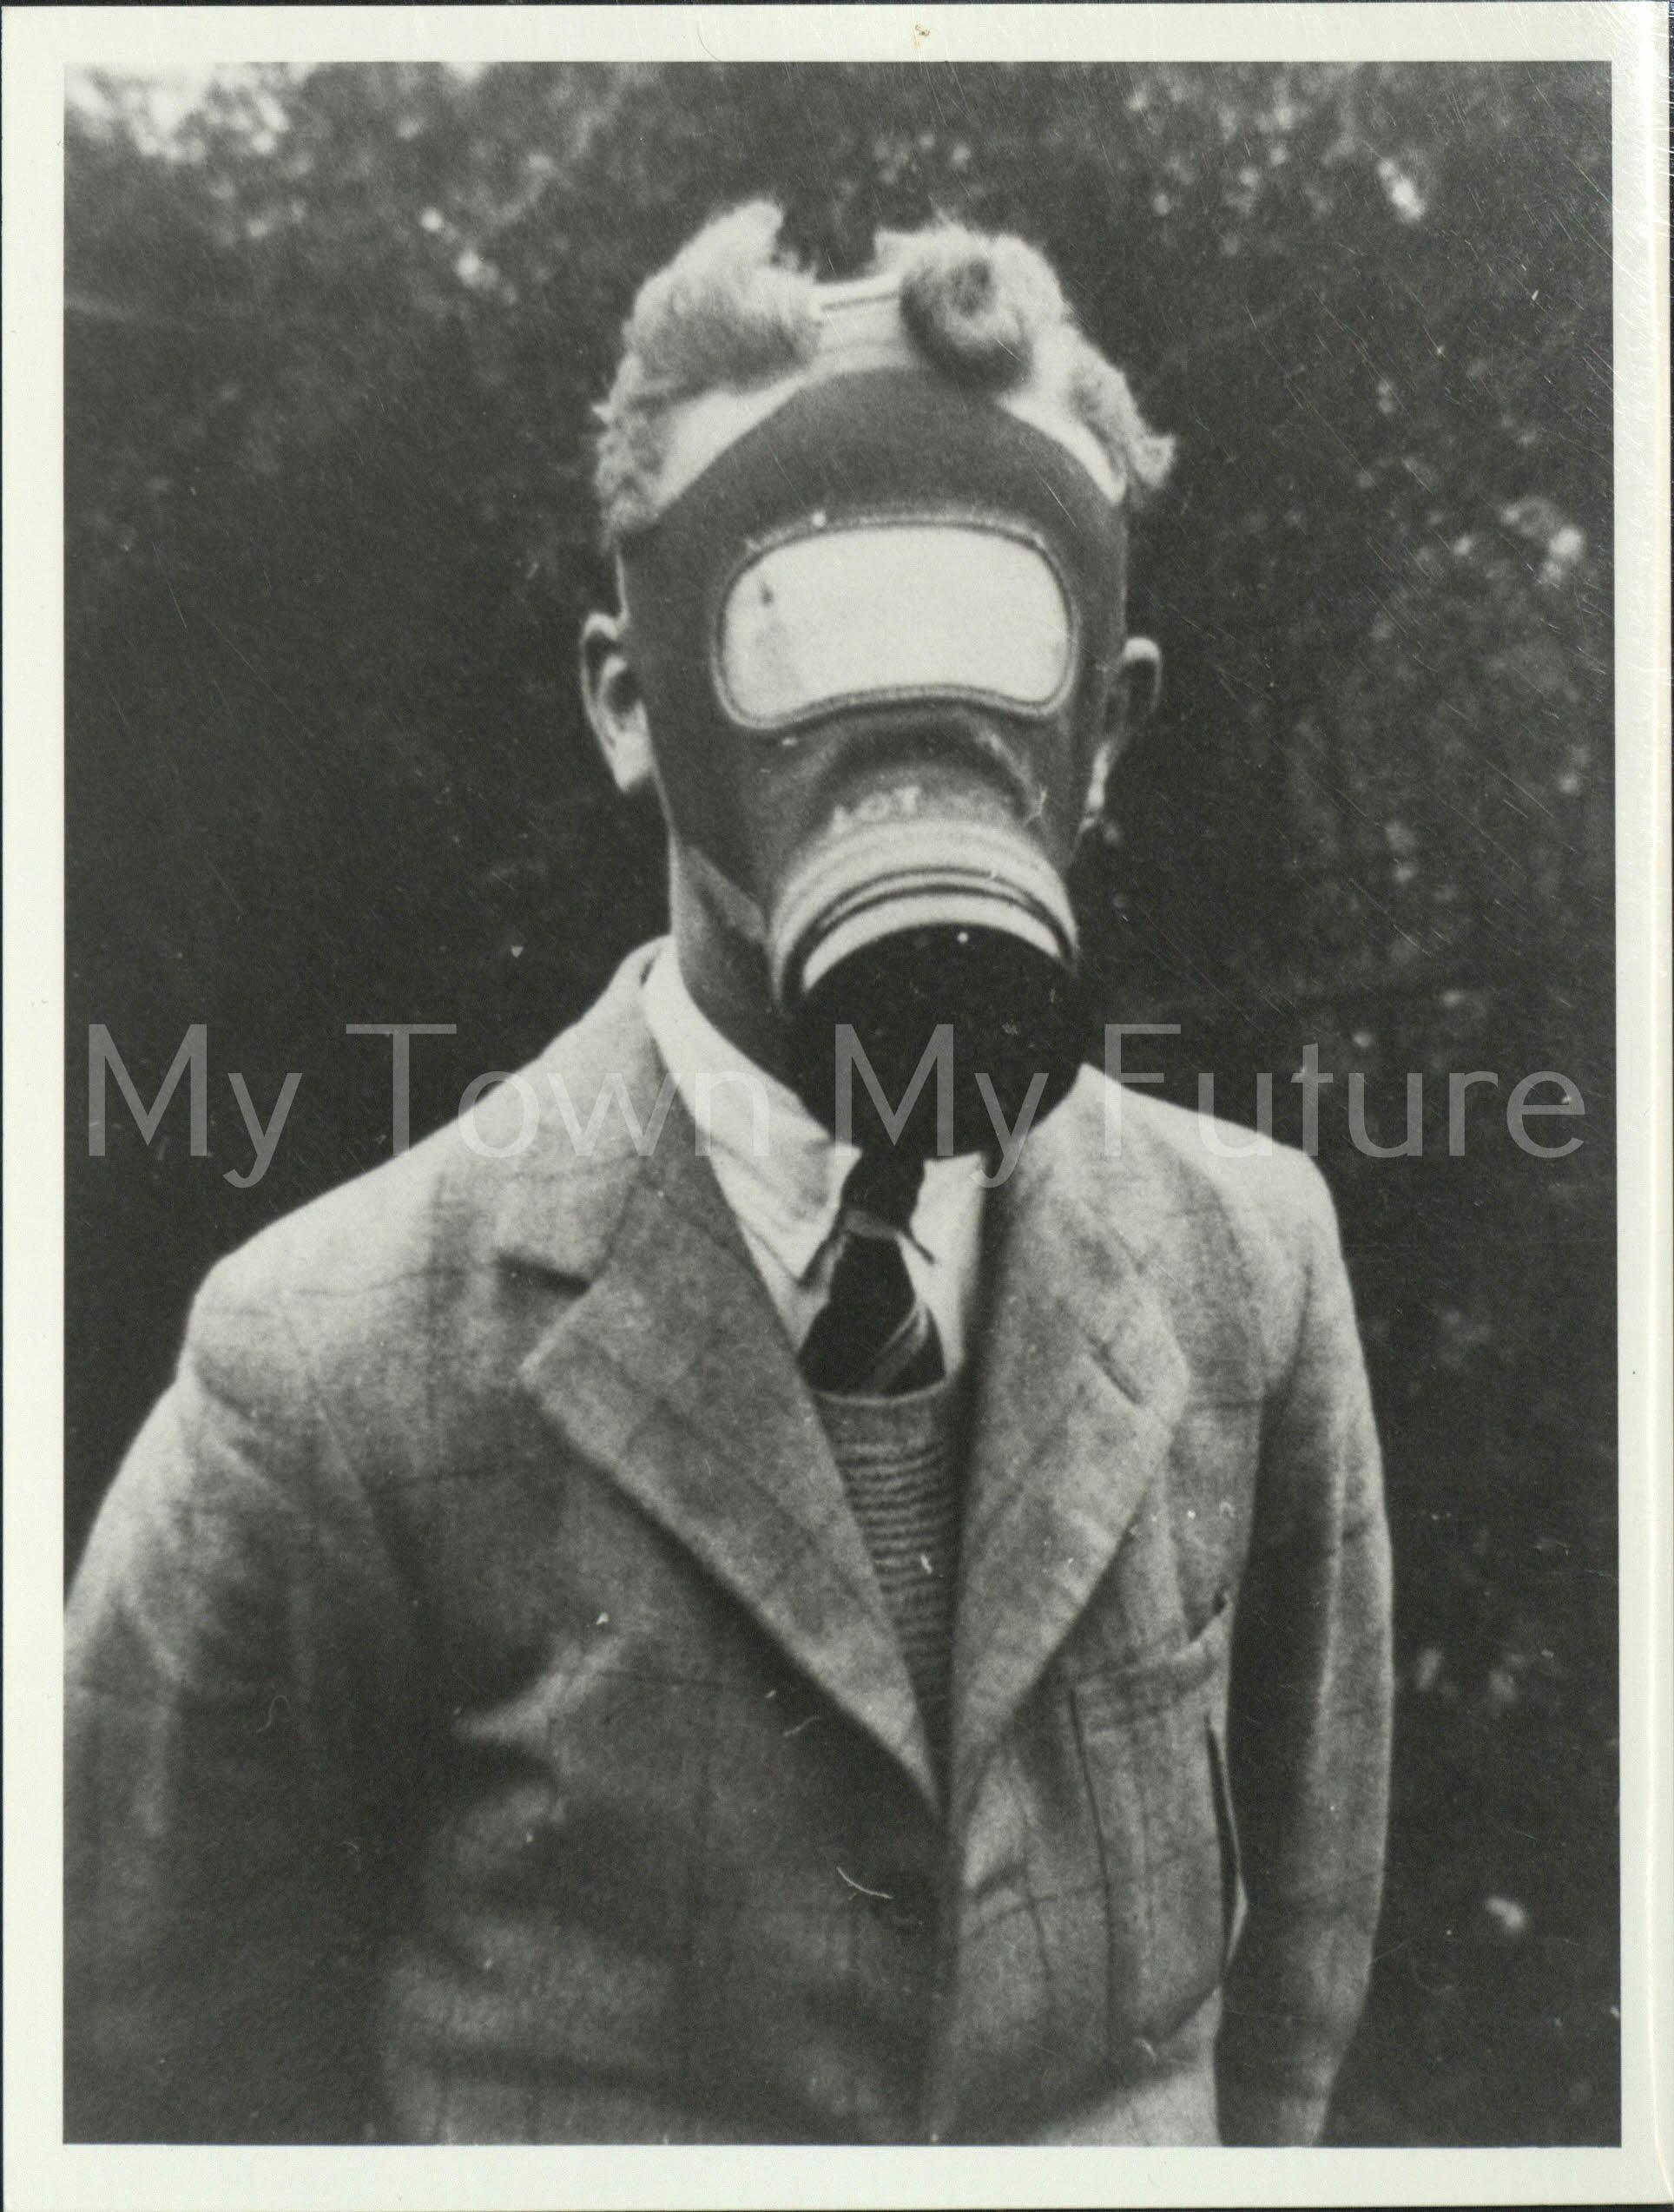 Civilian using gas mask, 1939 - Mr Warne - 42 Cambridge Road - Linthorpe